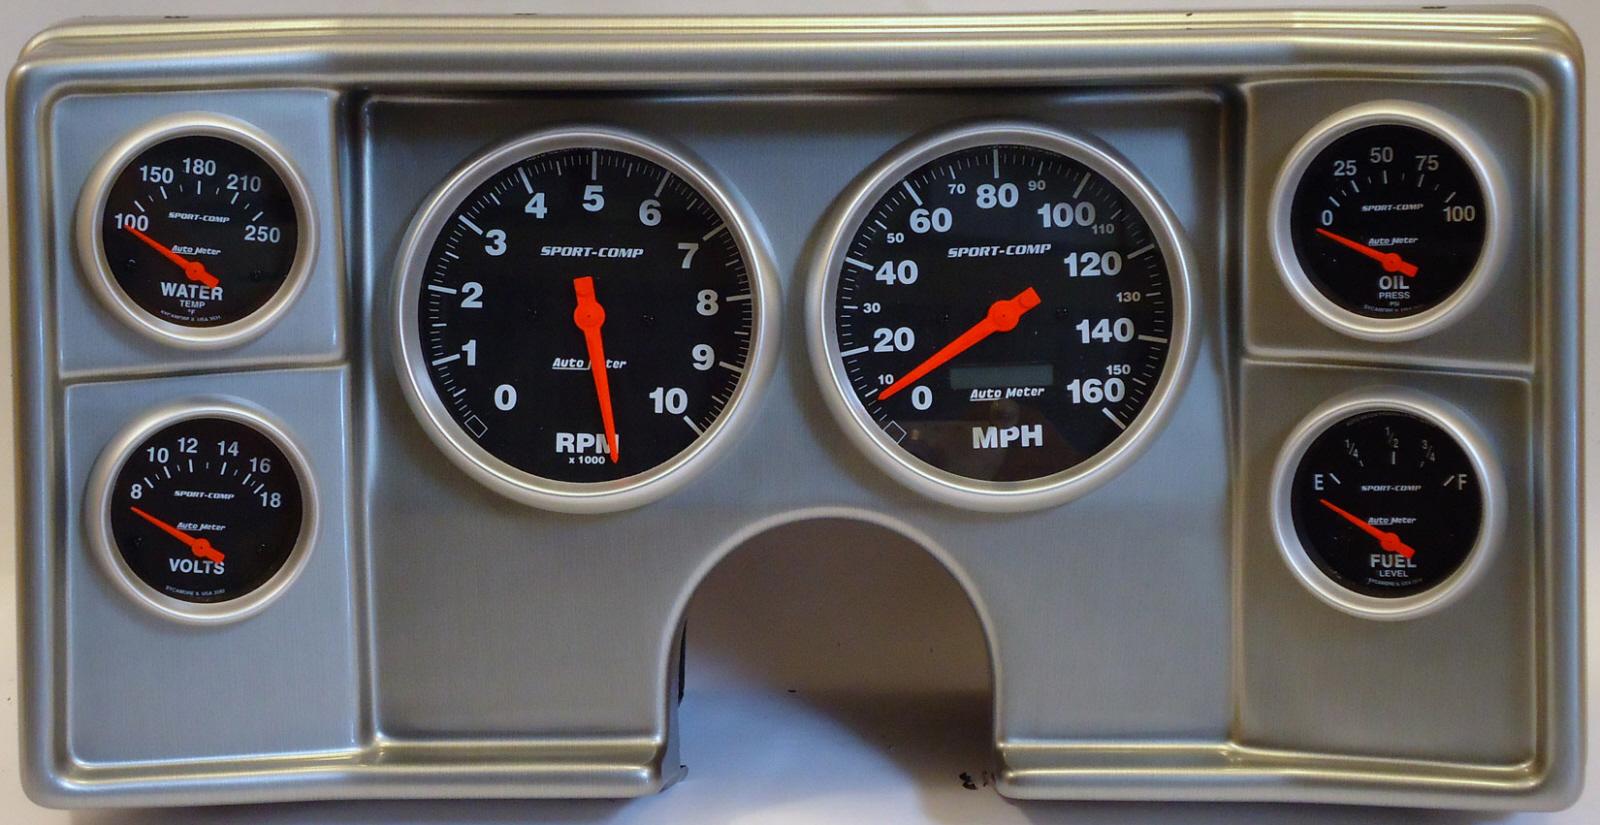 82-88 Chevy G Body Dash Panel w/ Sport Comp Electric Gauges | 170-82-